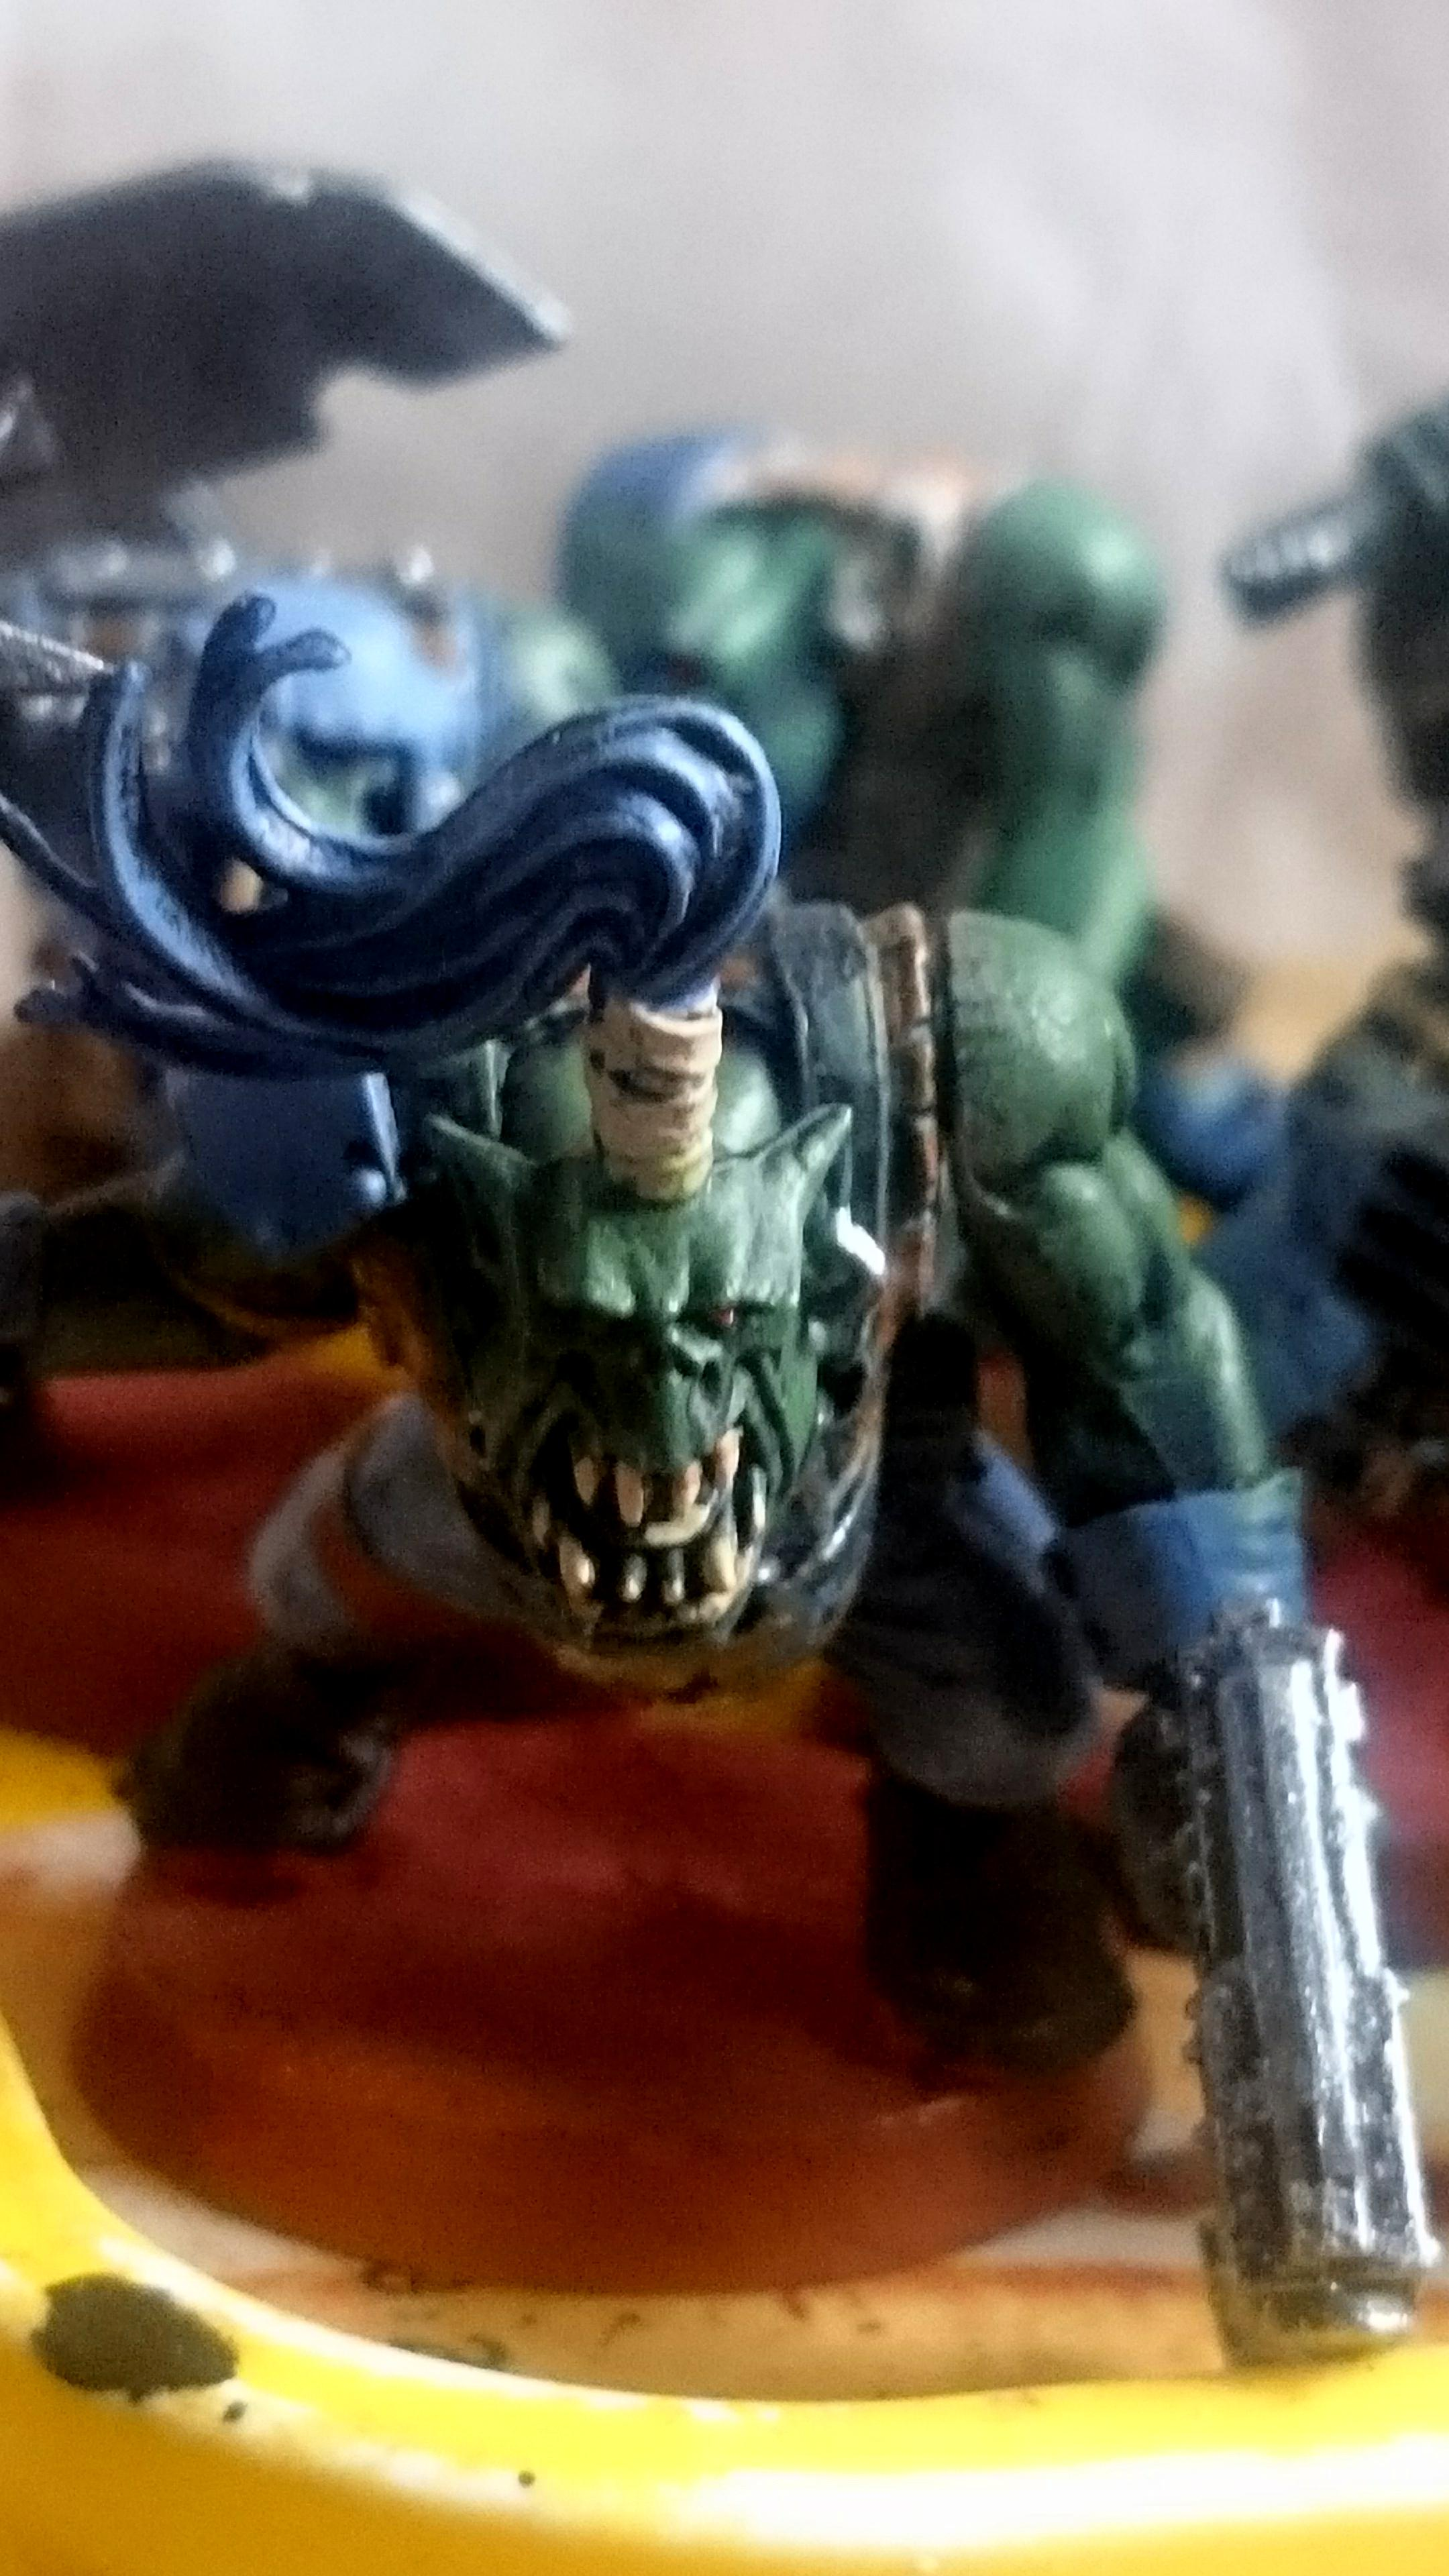 Deathskulls, Deffskulls, Orks, Warhammer 40,000